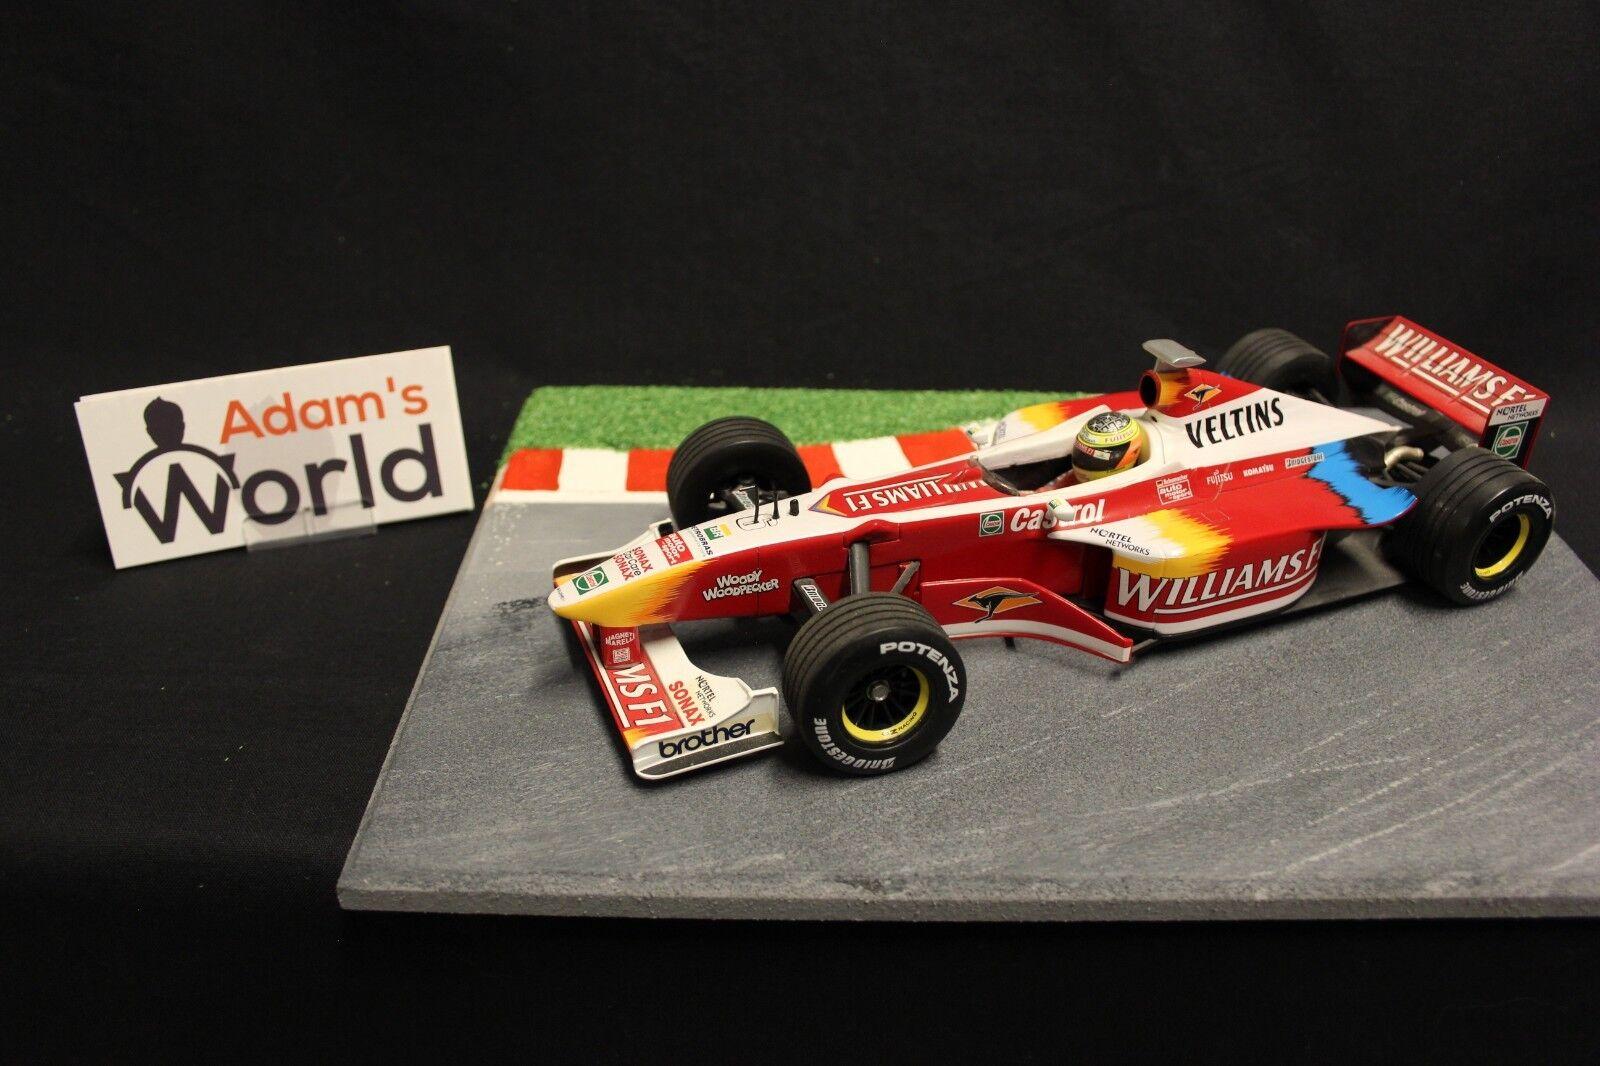 Minichamps Williams Supertec show car 1999 1:18 #6 Ralf Schumacher (GER) (F1NB)